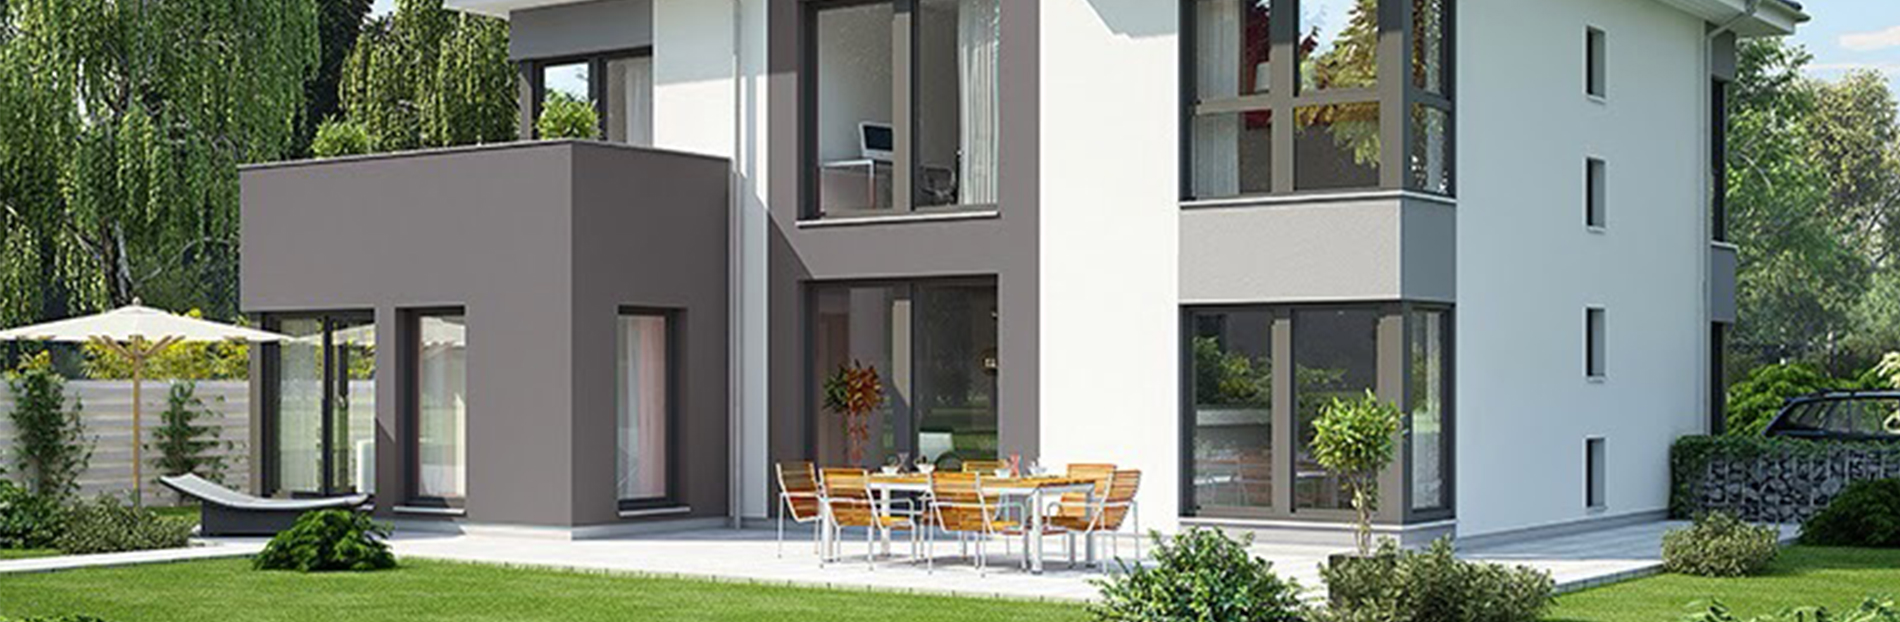 Immobilienmakler m nchen lico immobilien verkauf und for Immobilienmakler verkauf